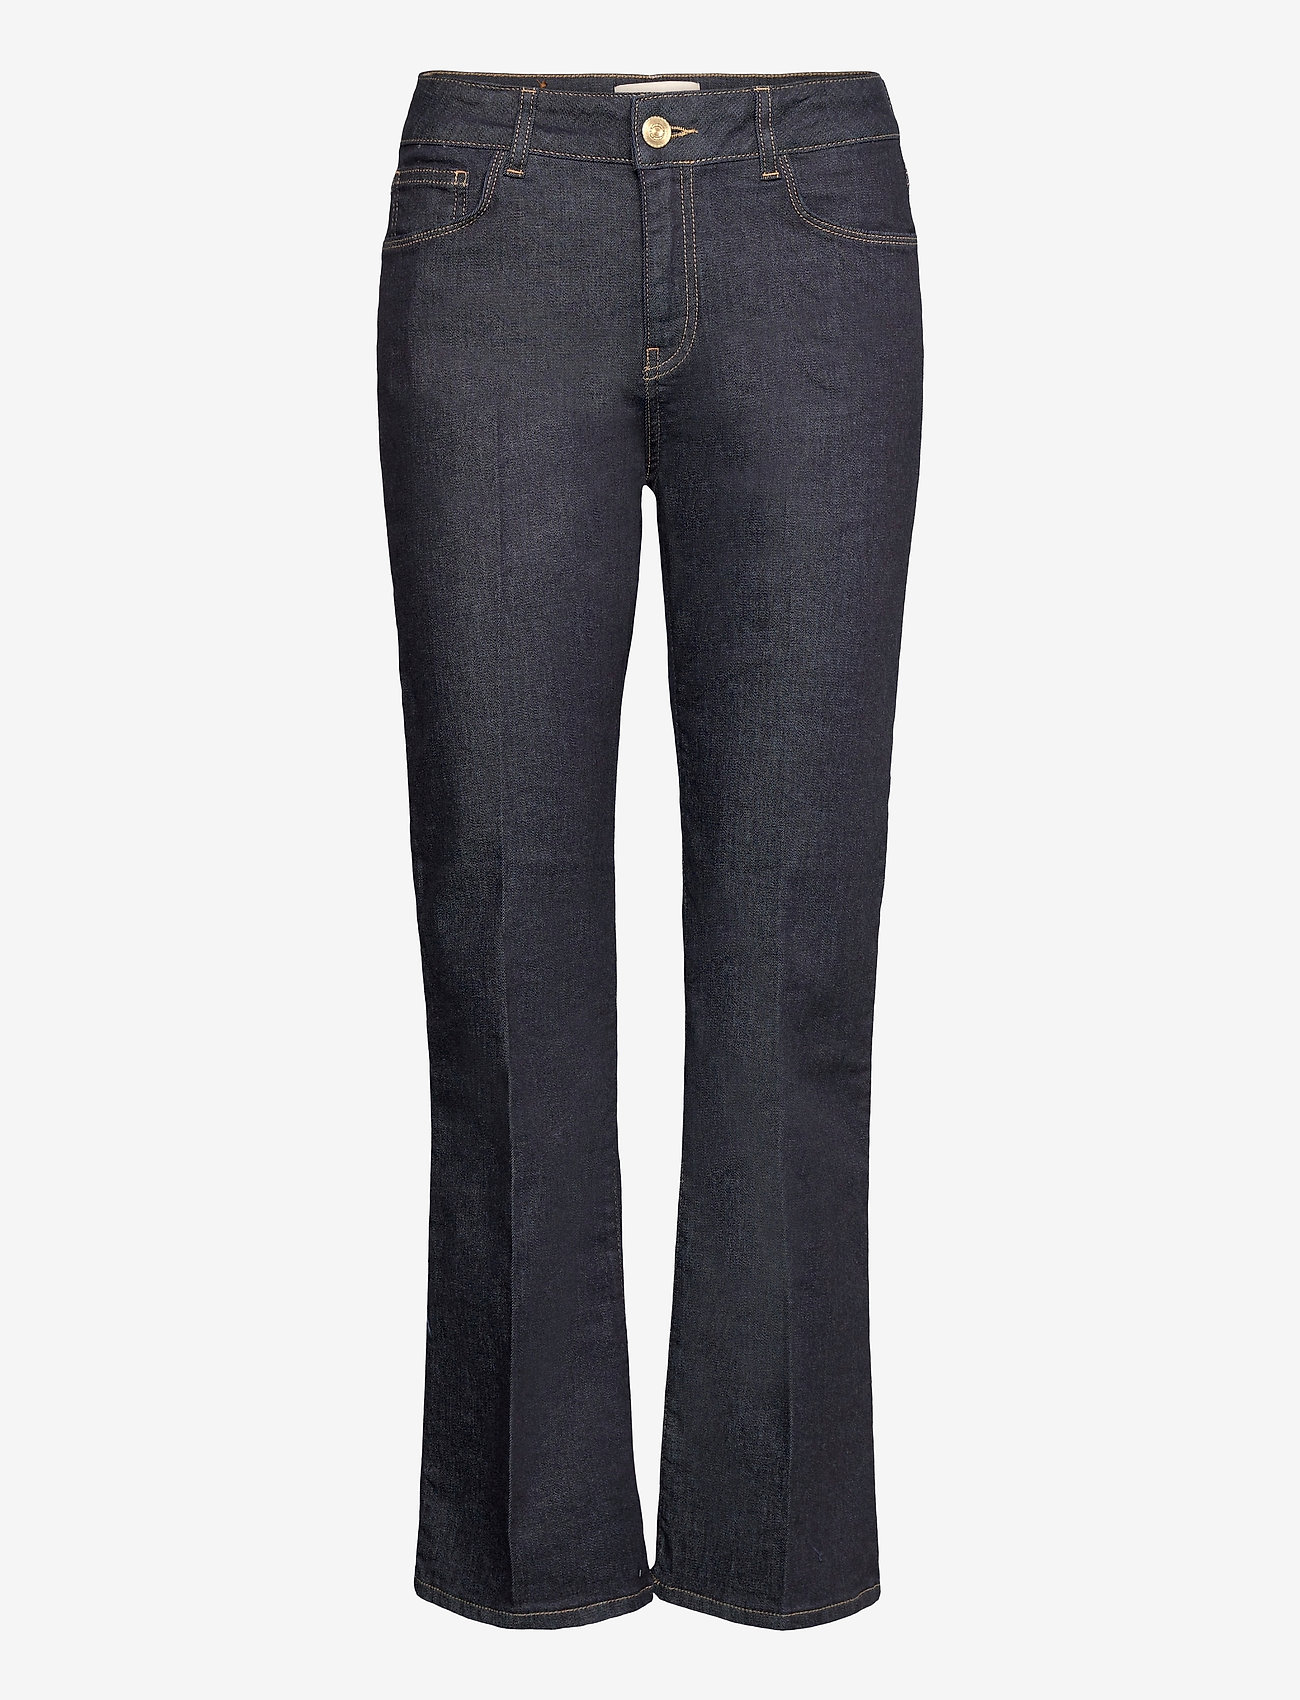 MOS MOSH - Cecilia Cover Jeans - schlaghosen - dark blue - 0